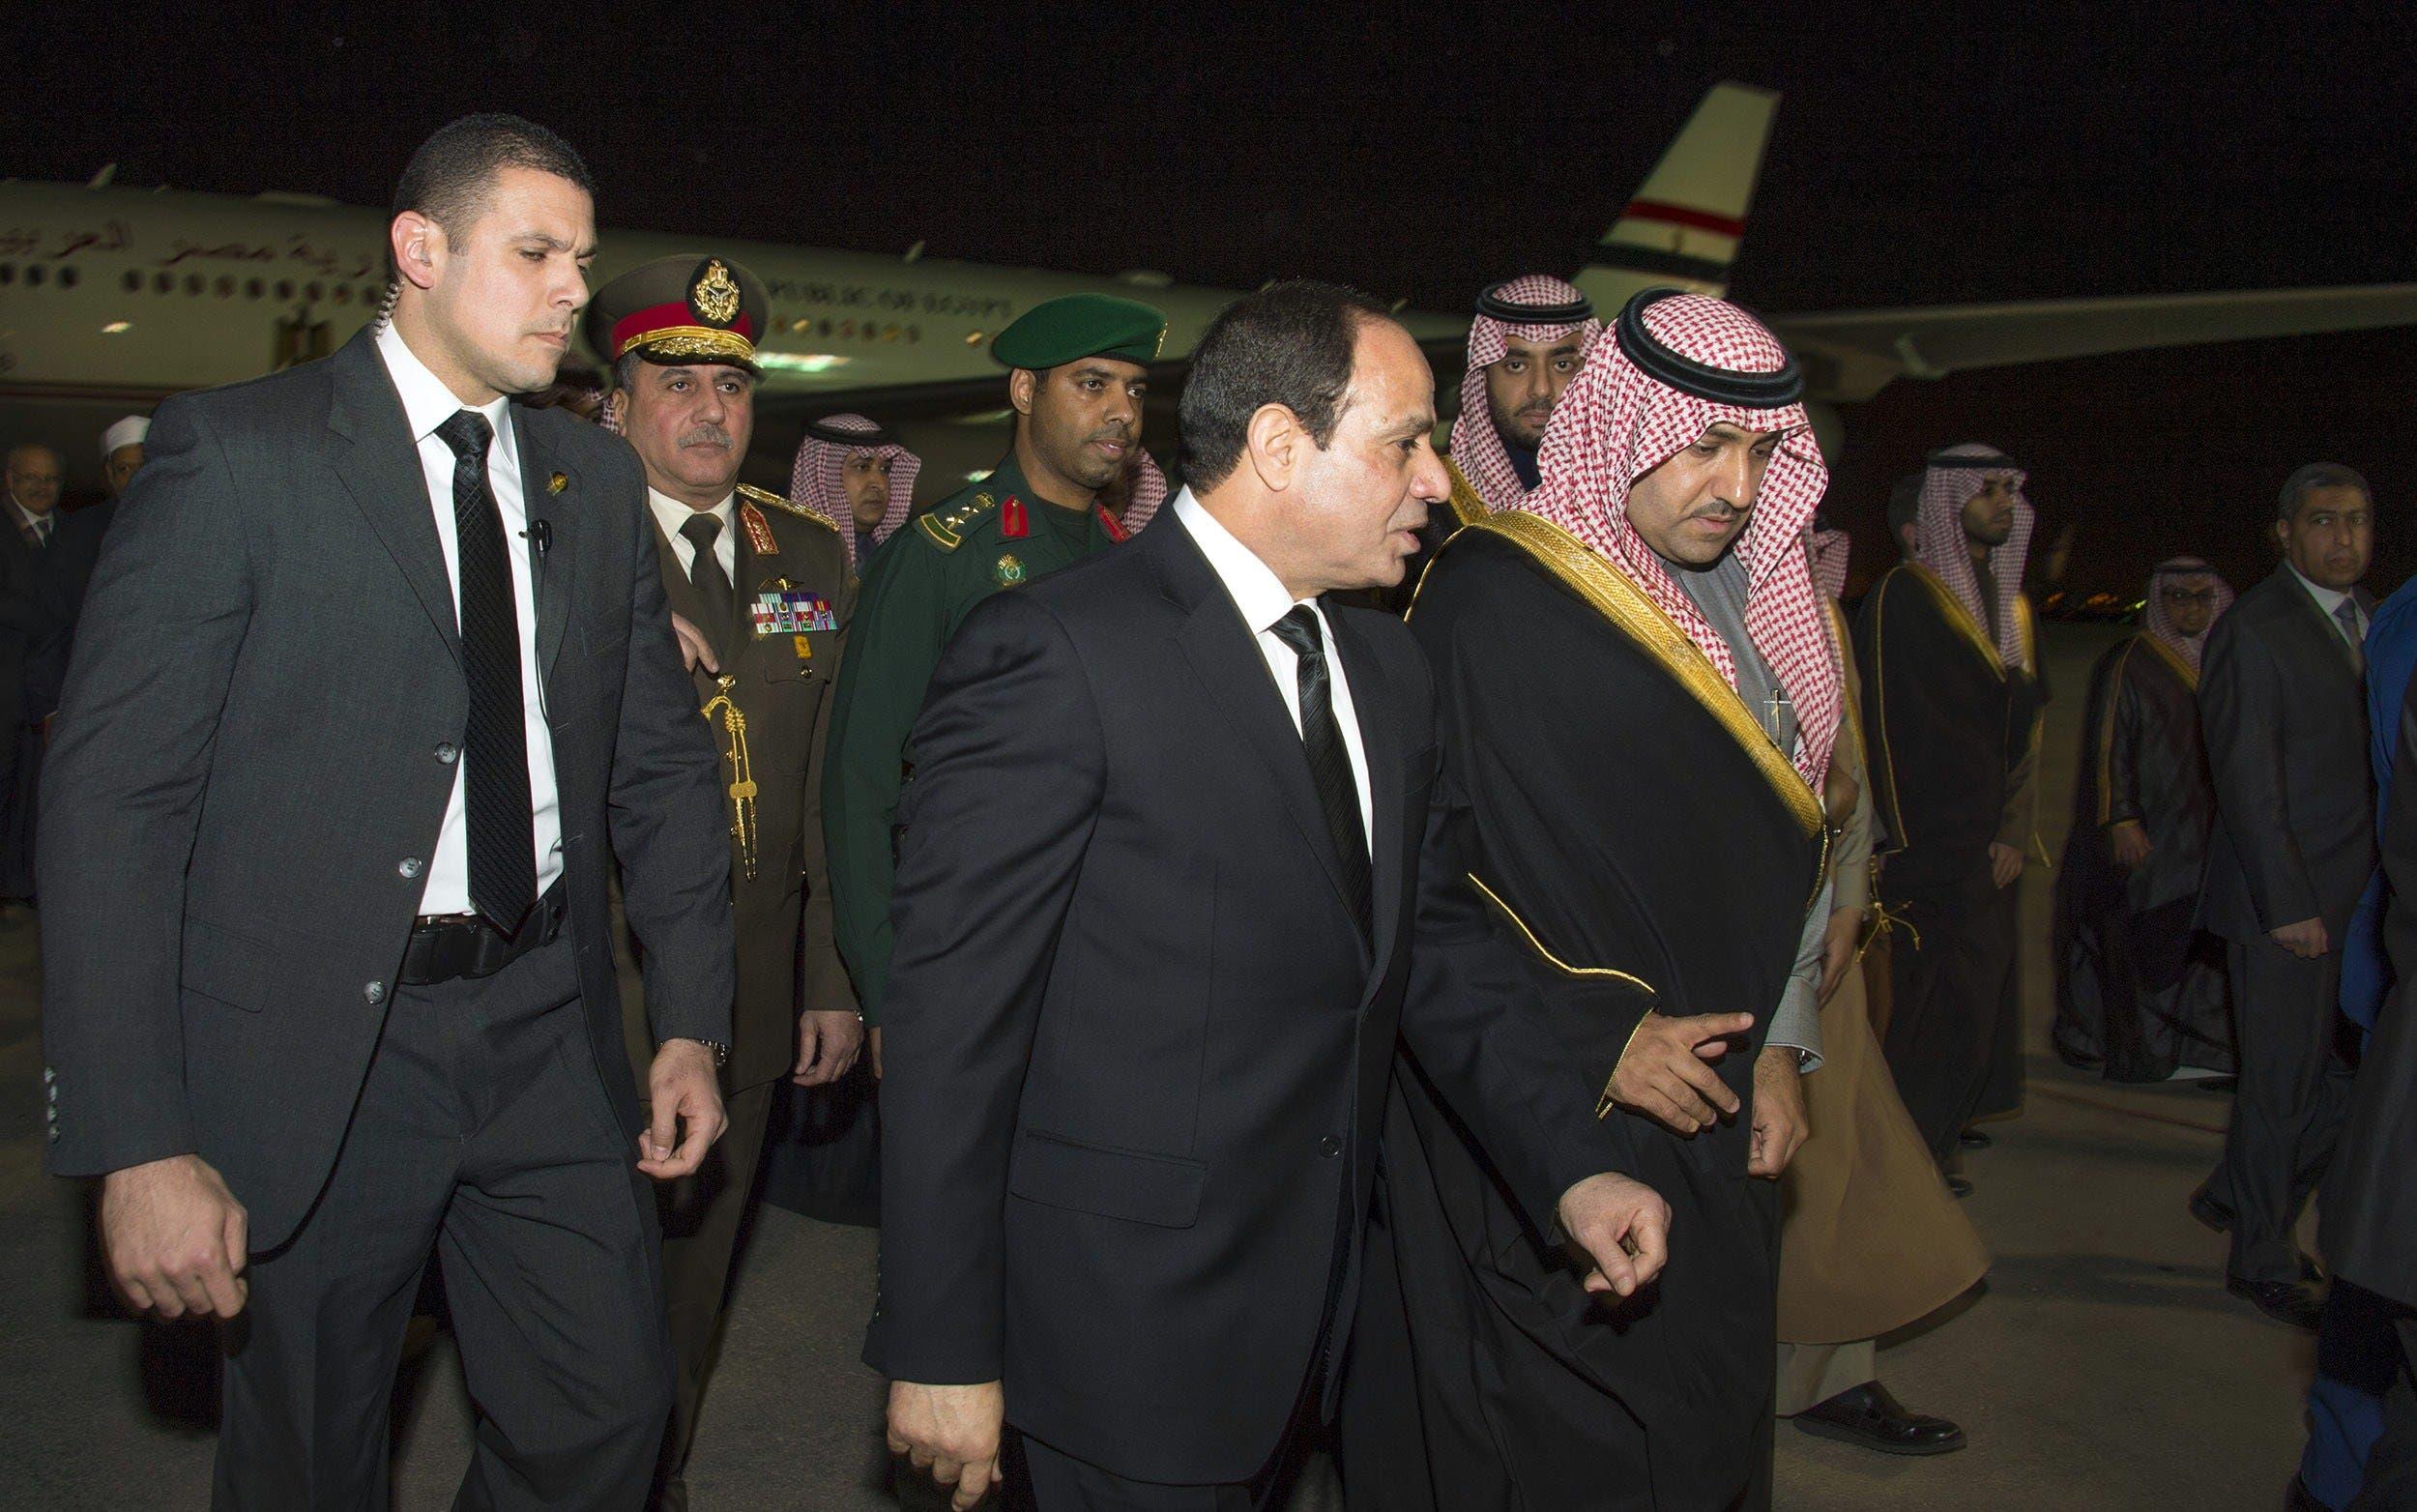 Saudi Prince and Emir of Riyadh Turki bin Abdullah bin Abdelaziz (R) welcoming Egyptian President Abdel Fattah al-Sisi (C) upon his arrival in Riyadh to offer condolences after the death of King Abdullah. (AFP)